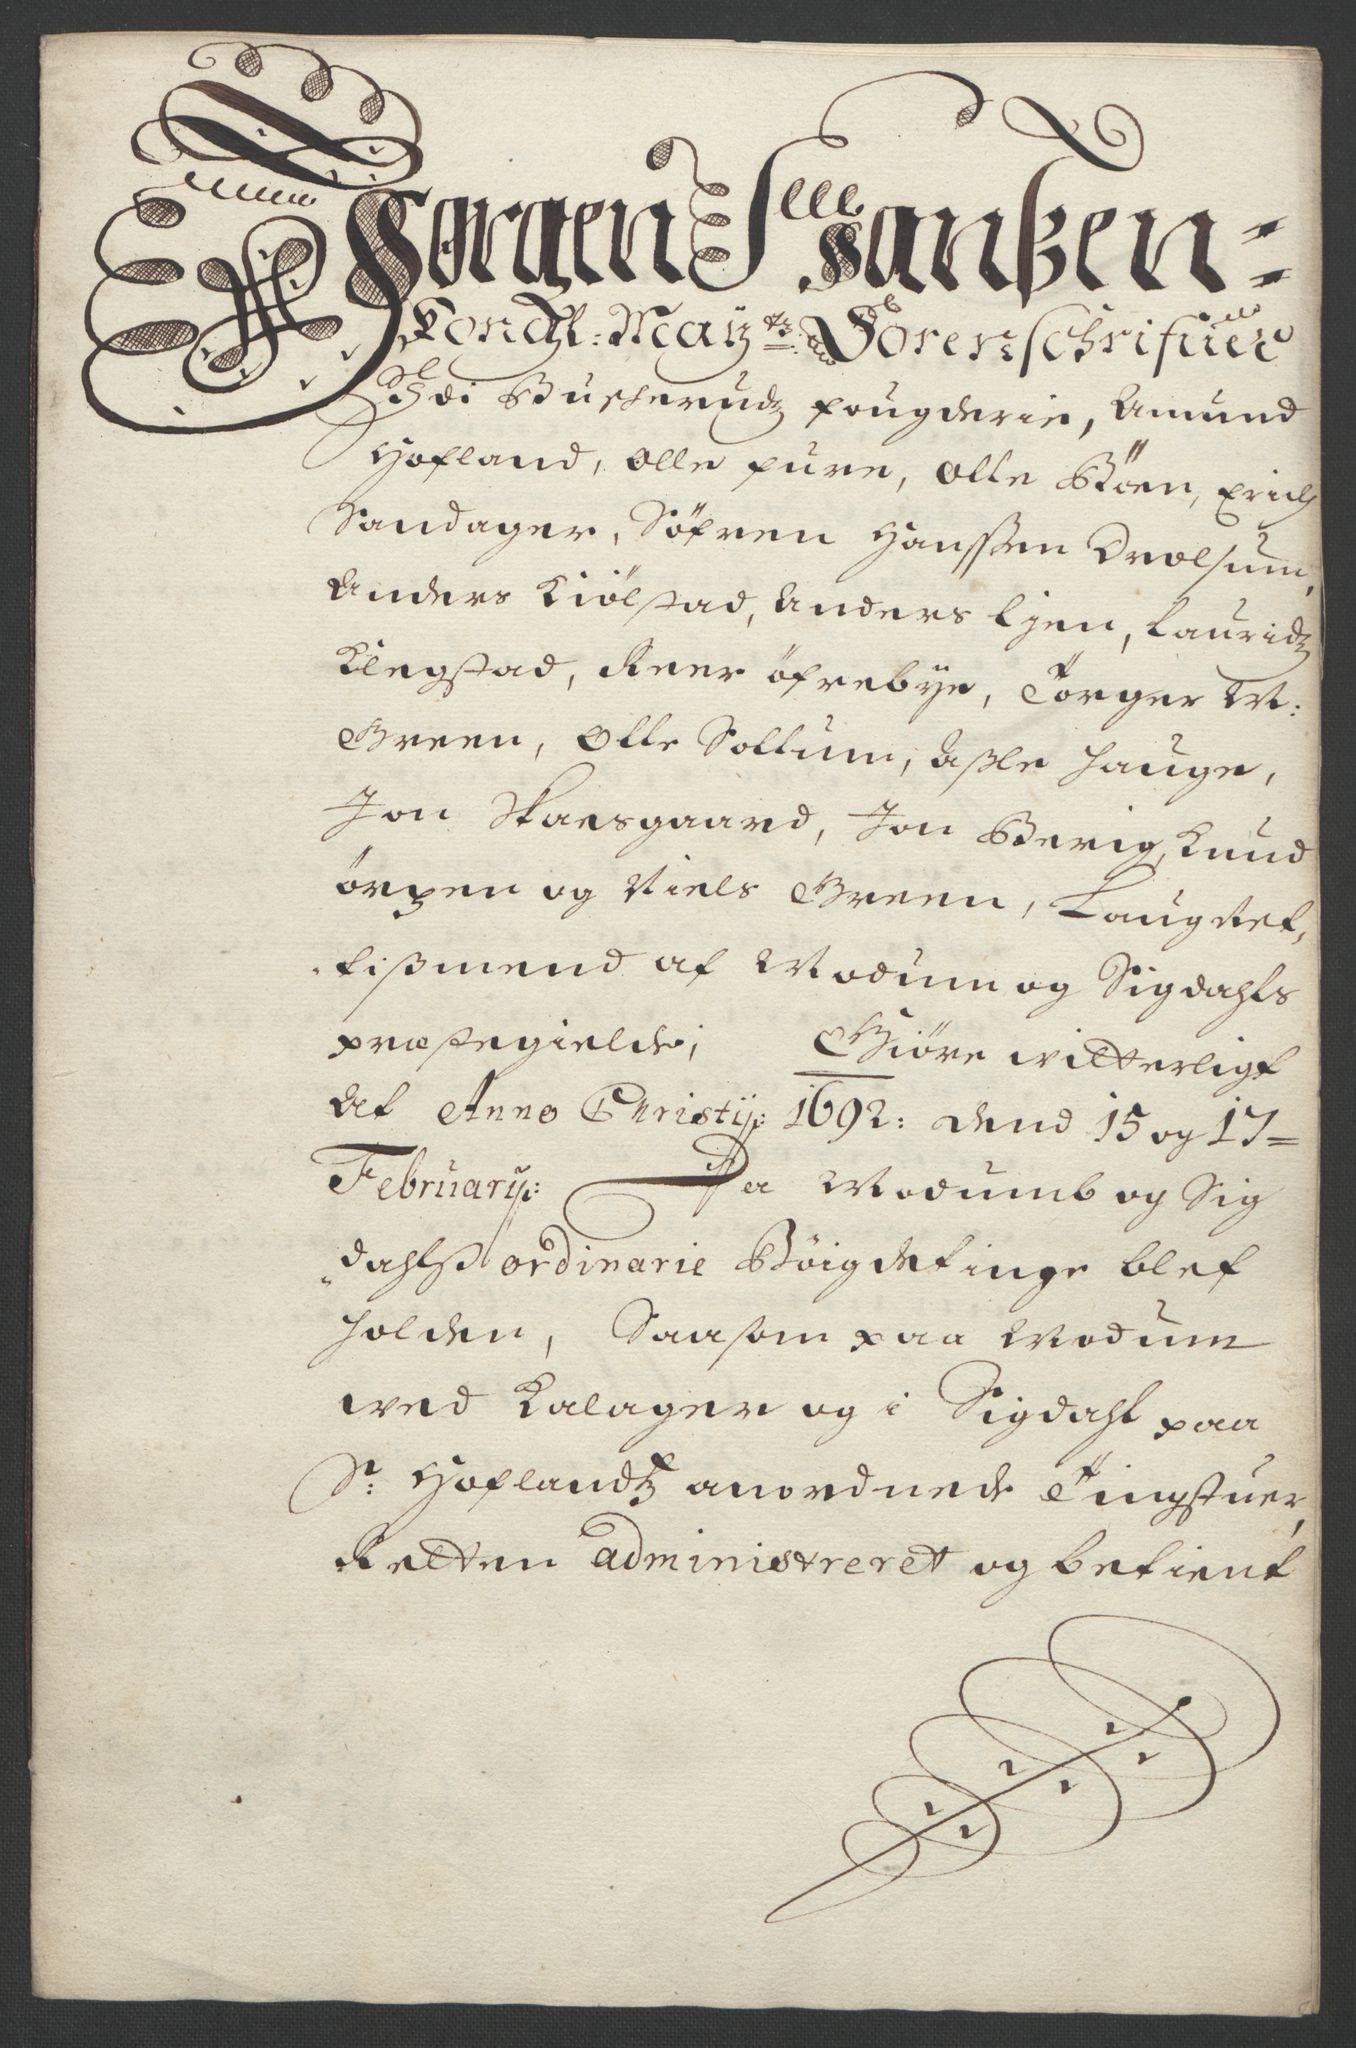 RA, Rentekammeret inntil 1814, Reviderte regnskaper, Fogderegnskap, R25/L1681: Fogderegnskap Buskerud, 1691-1692, s. 456